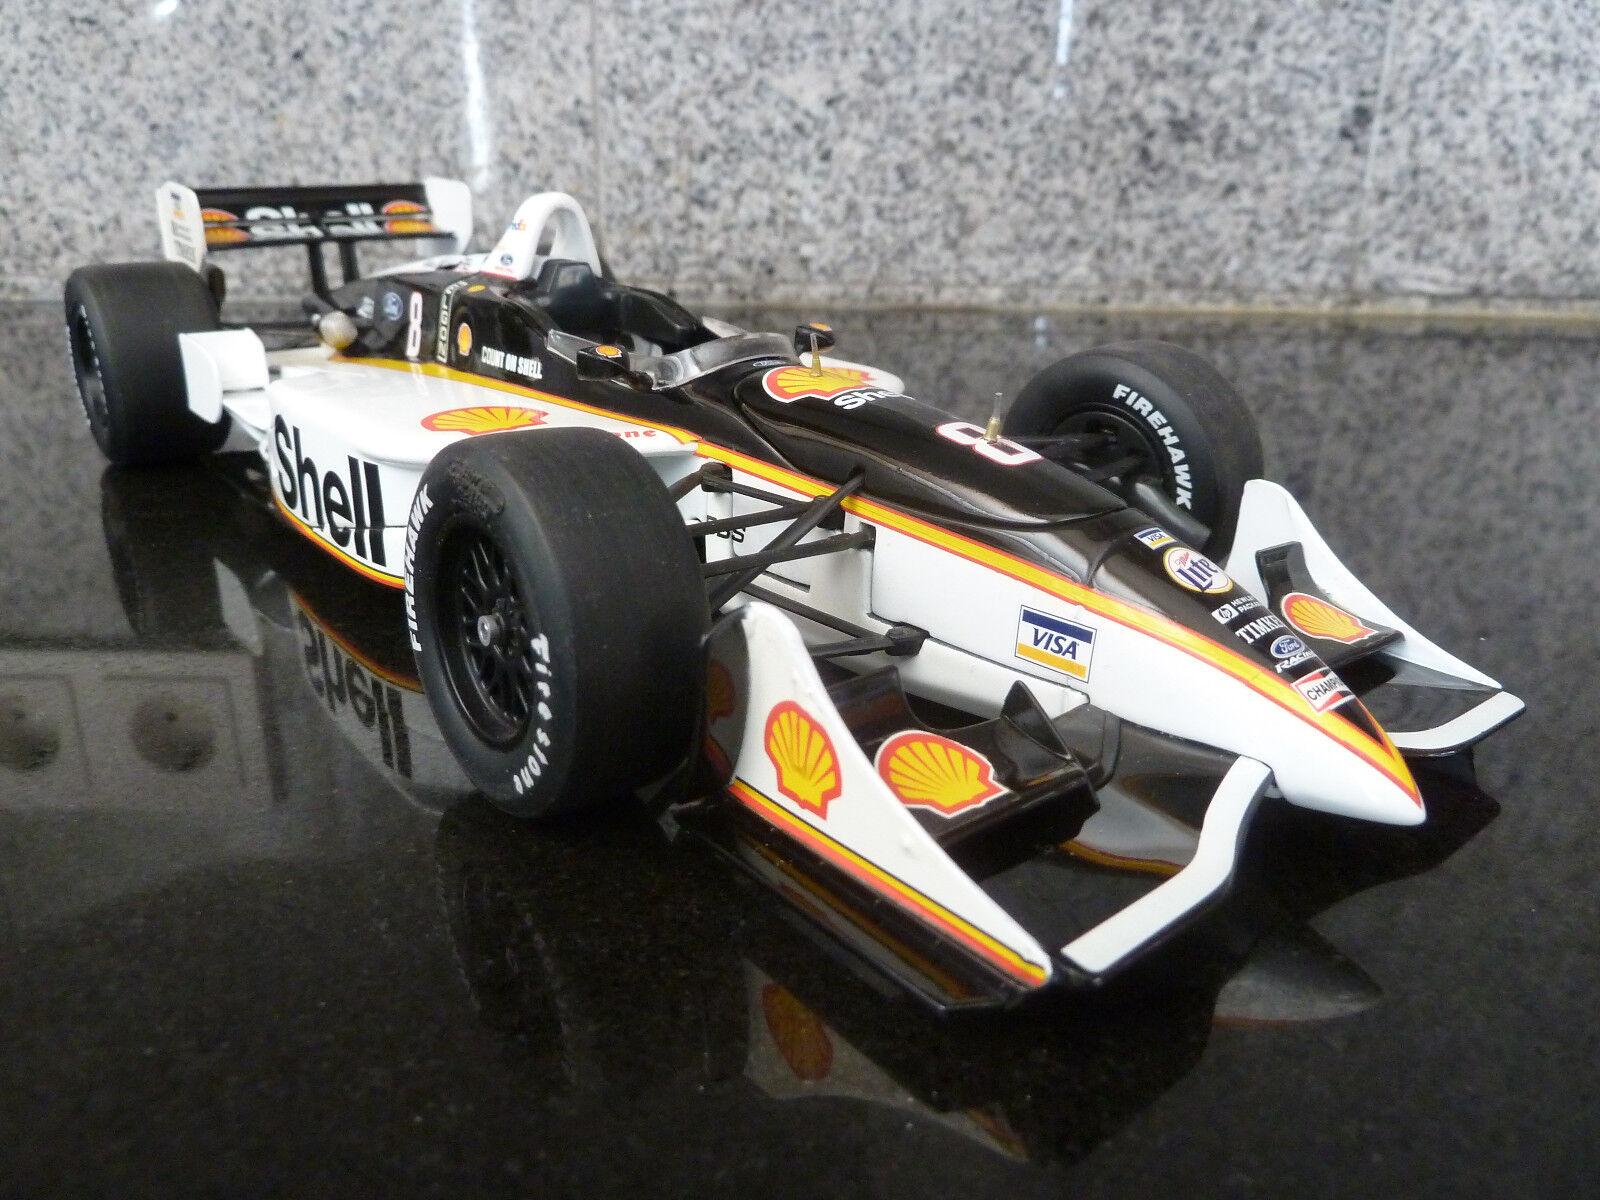 1  18 action, Reynard 1999, Bryan HERTA, Shell  excellent prix